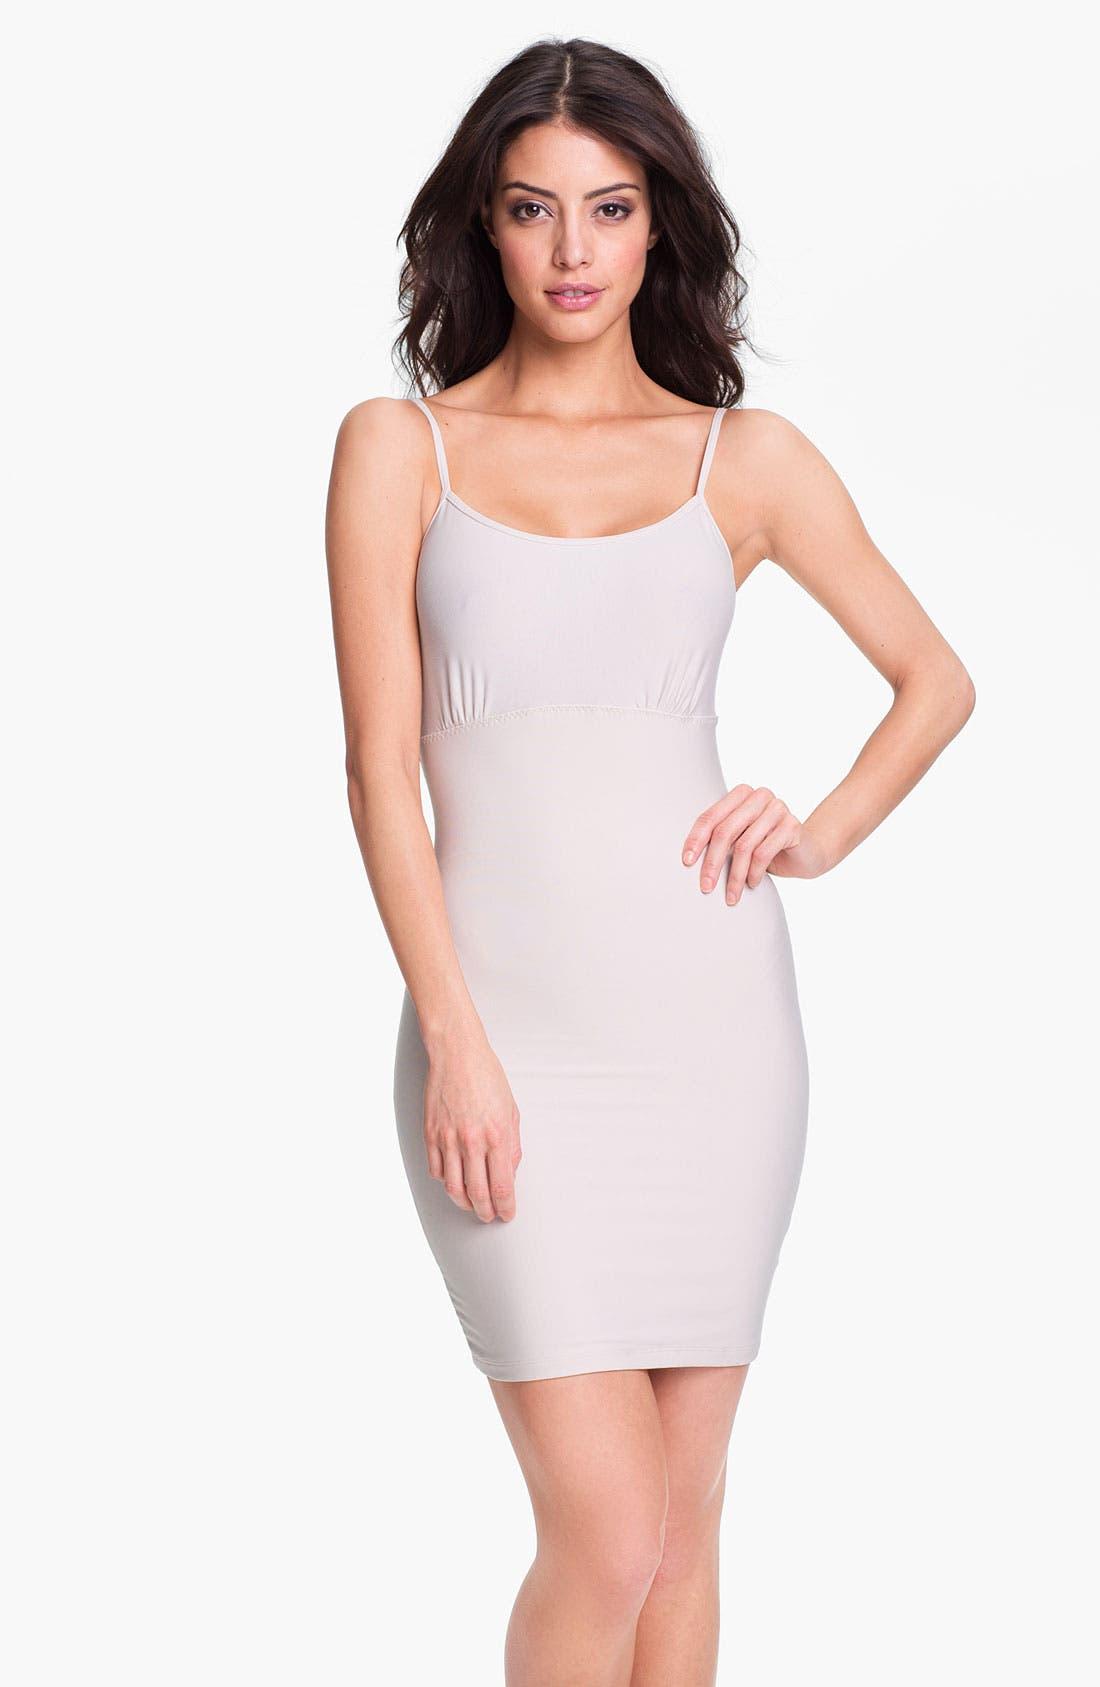 Main Image - SPANX® 'Spoil Me Cotton' Shaping Slip